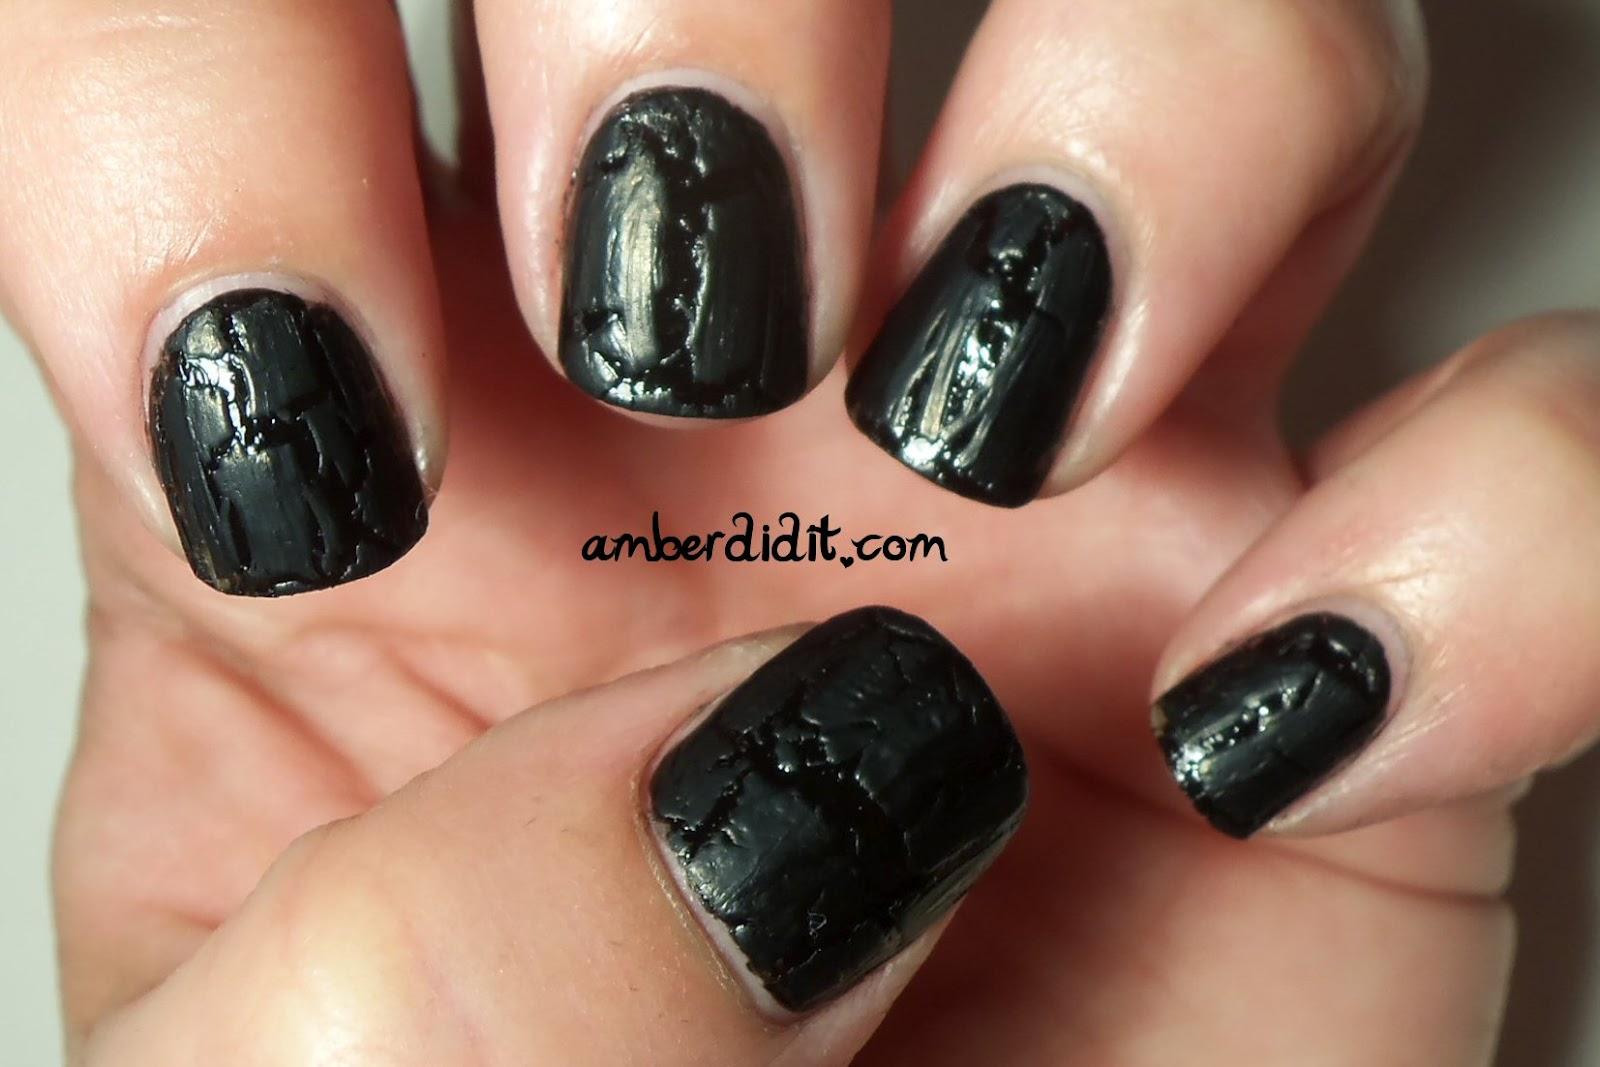 Amber did it!: Black on Black Crackle~Nail FAIL